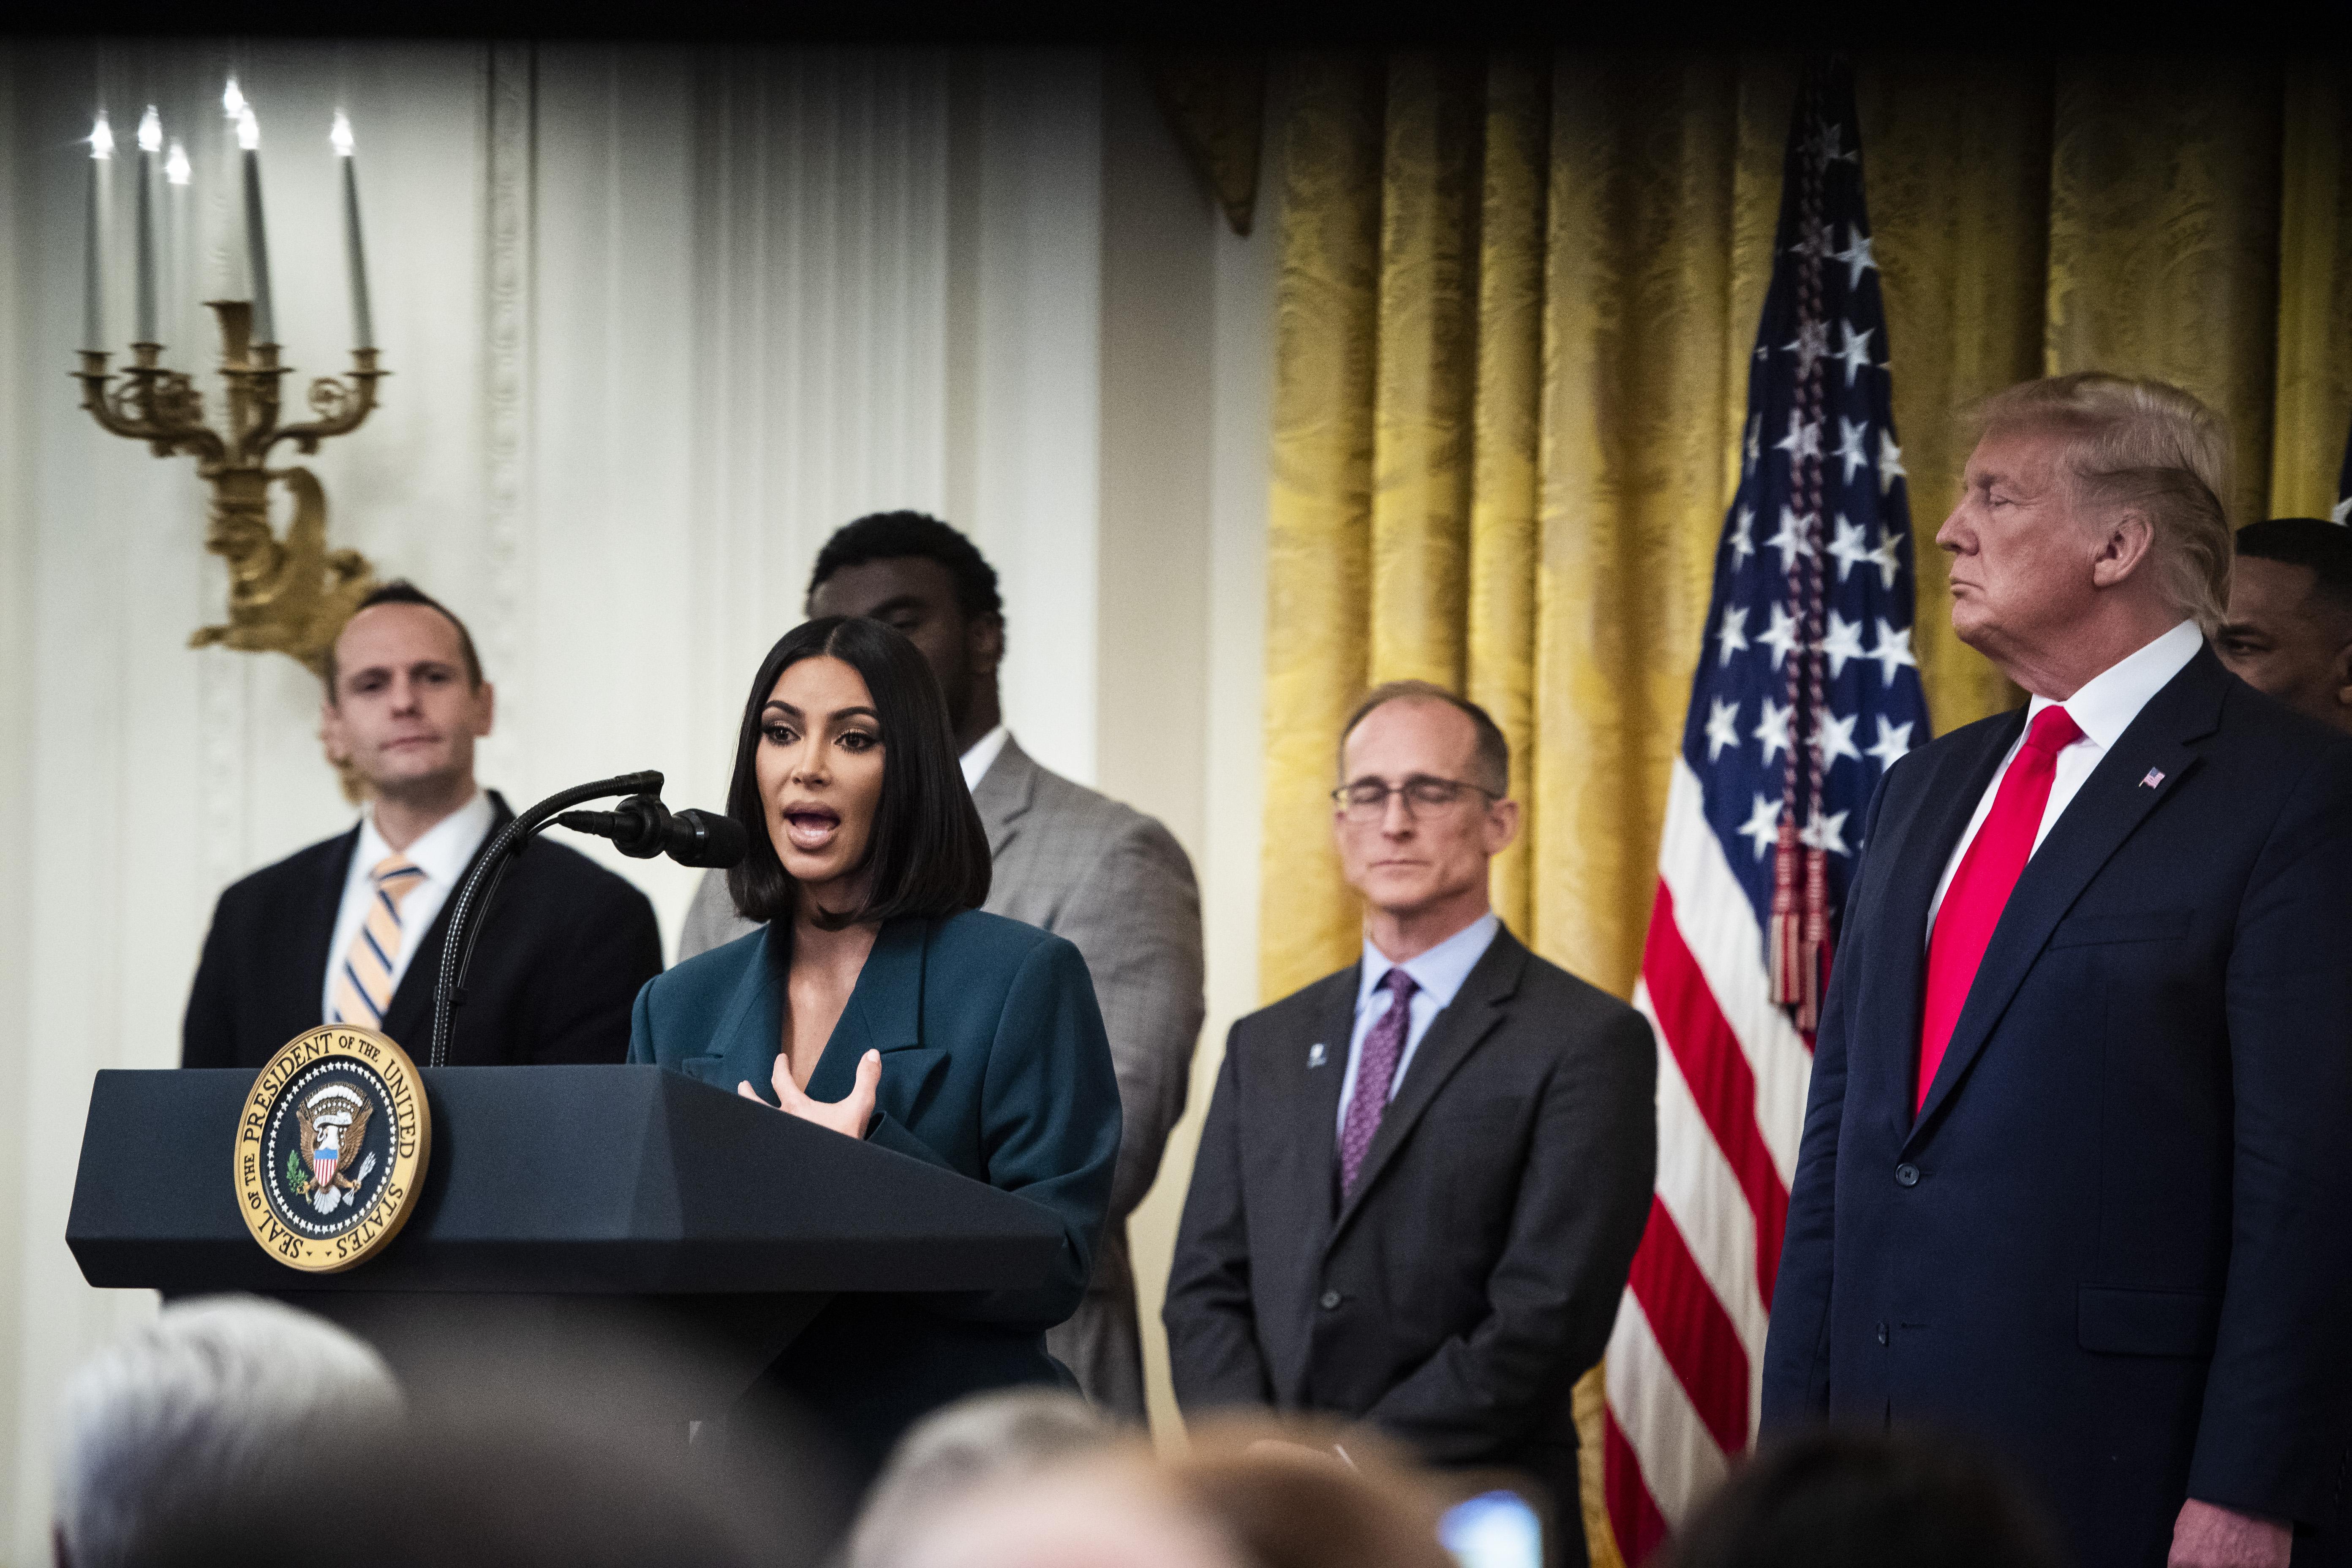 Kim Kardashian spotted filming at D C  jail - The Washington